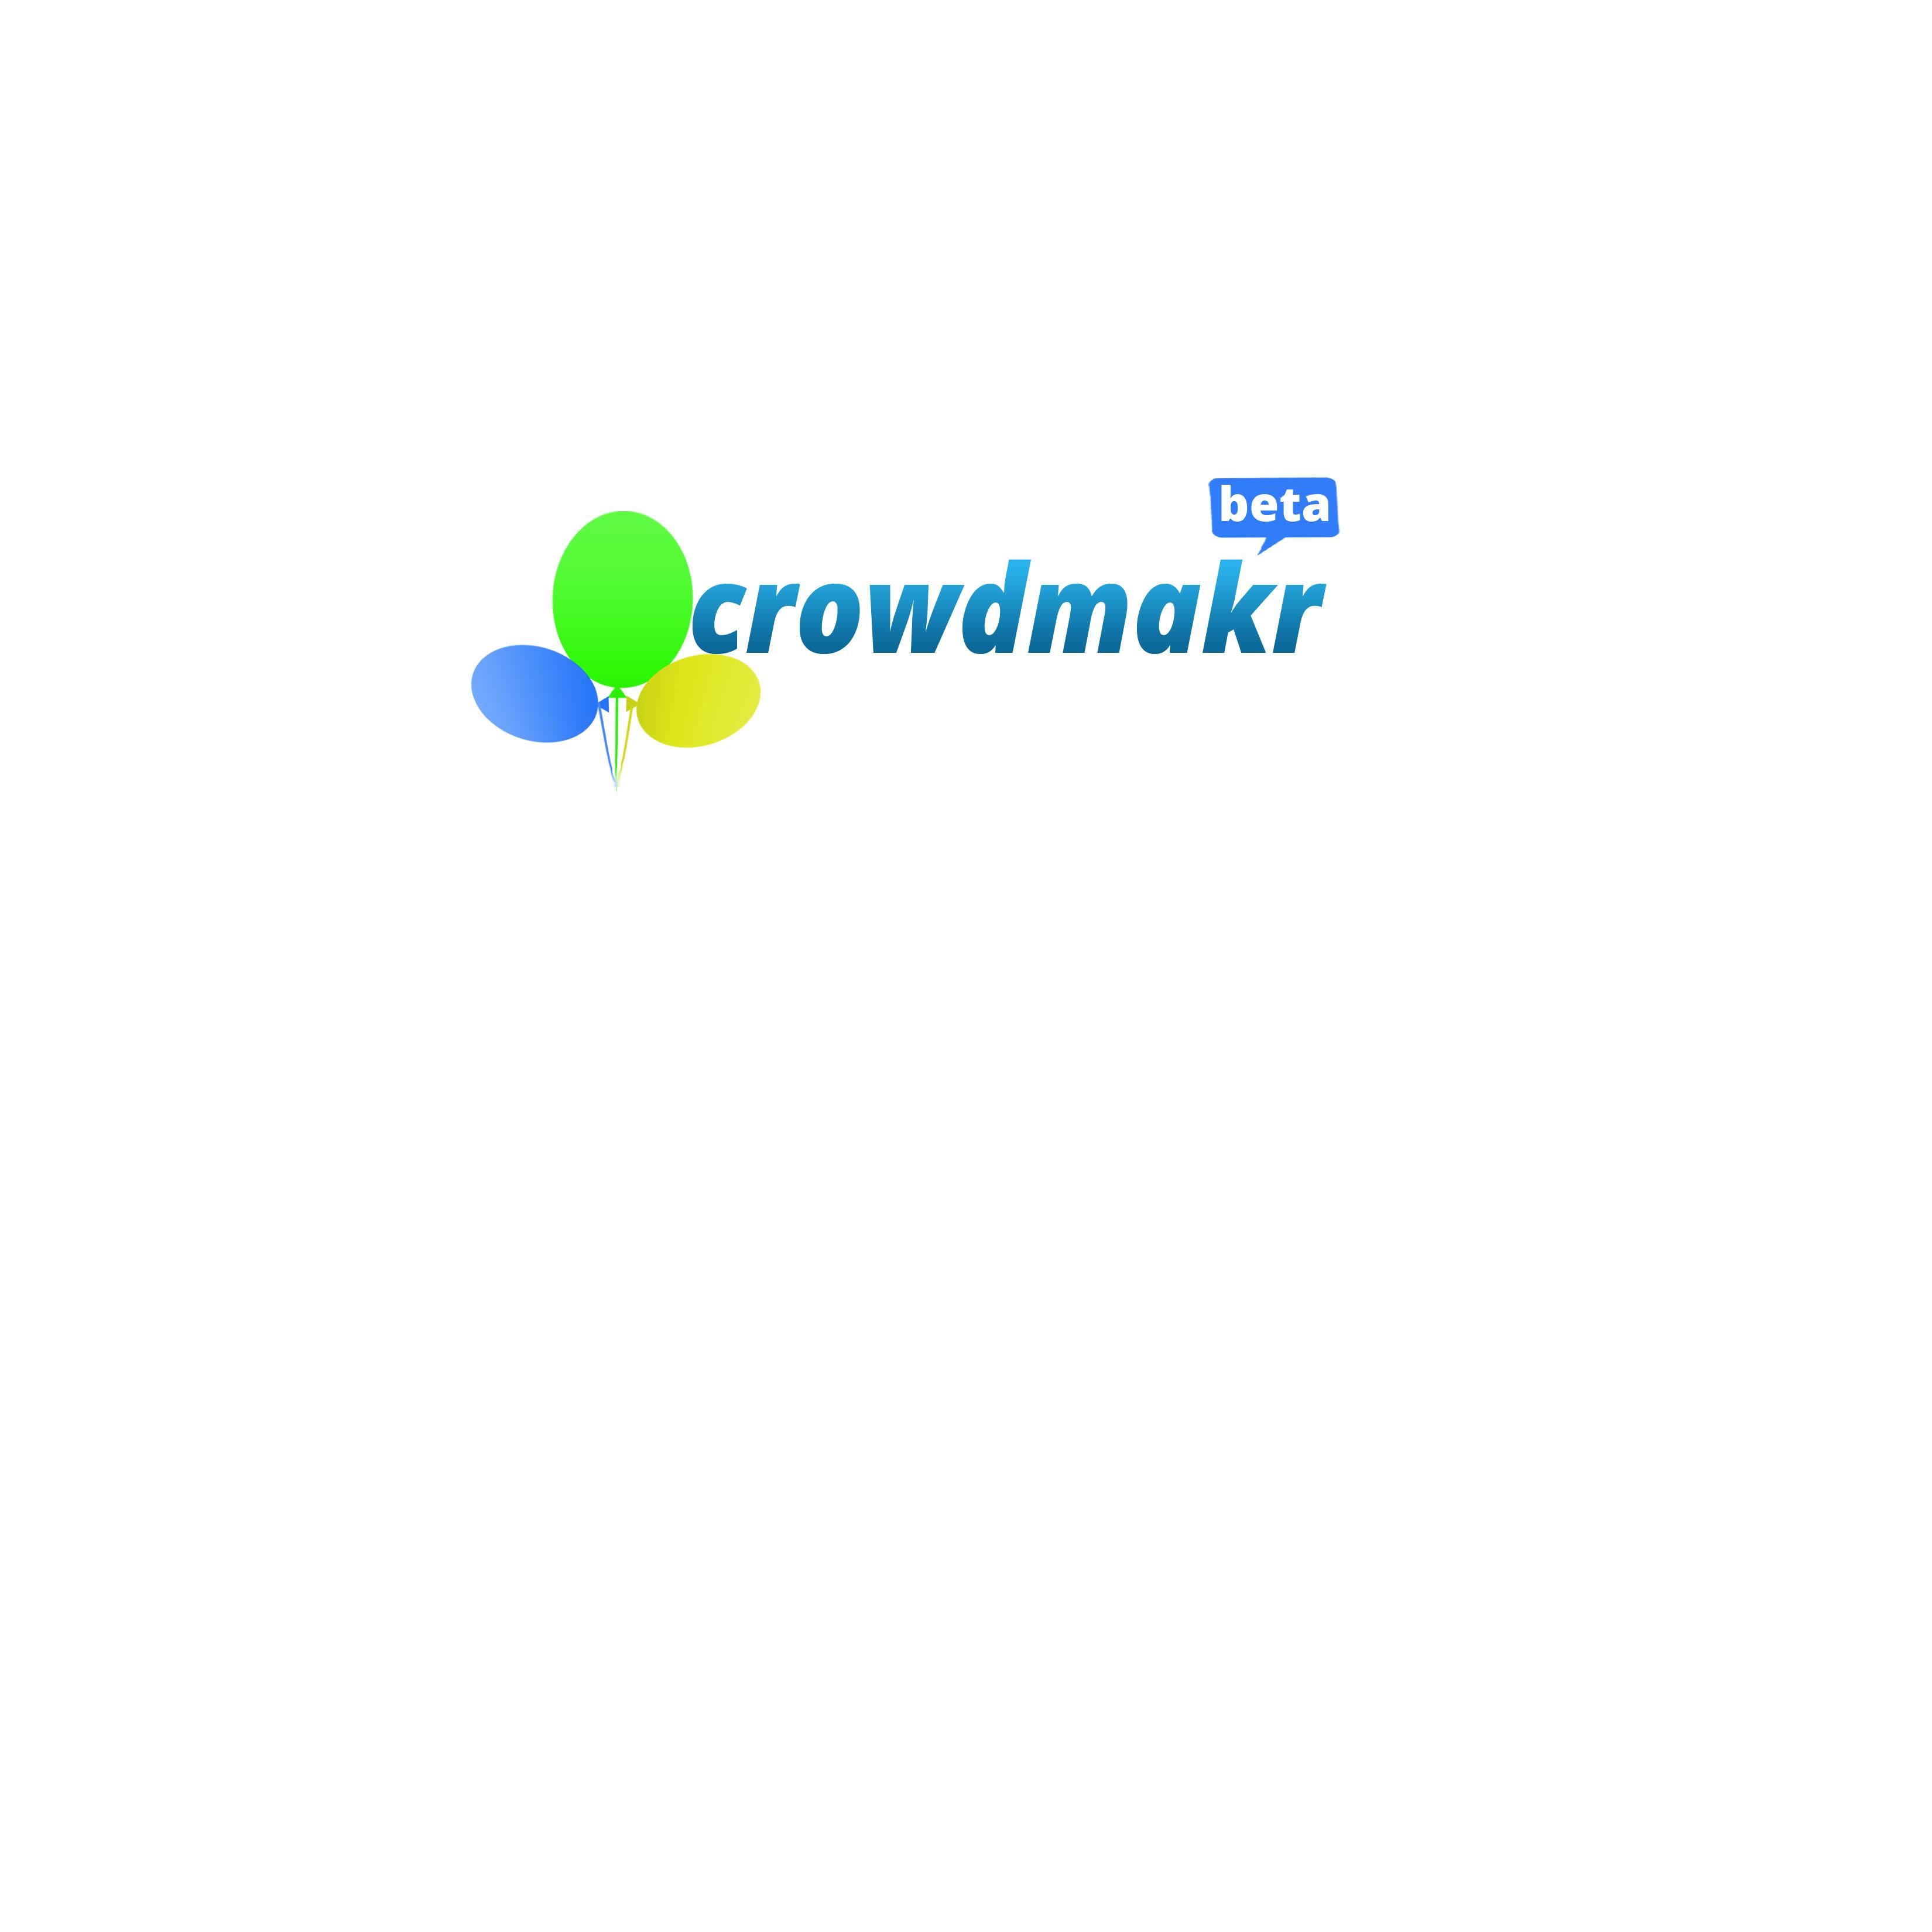 Logo Design by Allan Esclamado - Entry No. 61 in the Logo Design Contest Unique Logo Design Wanted for crowdmakr.